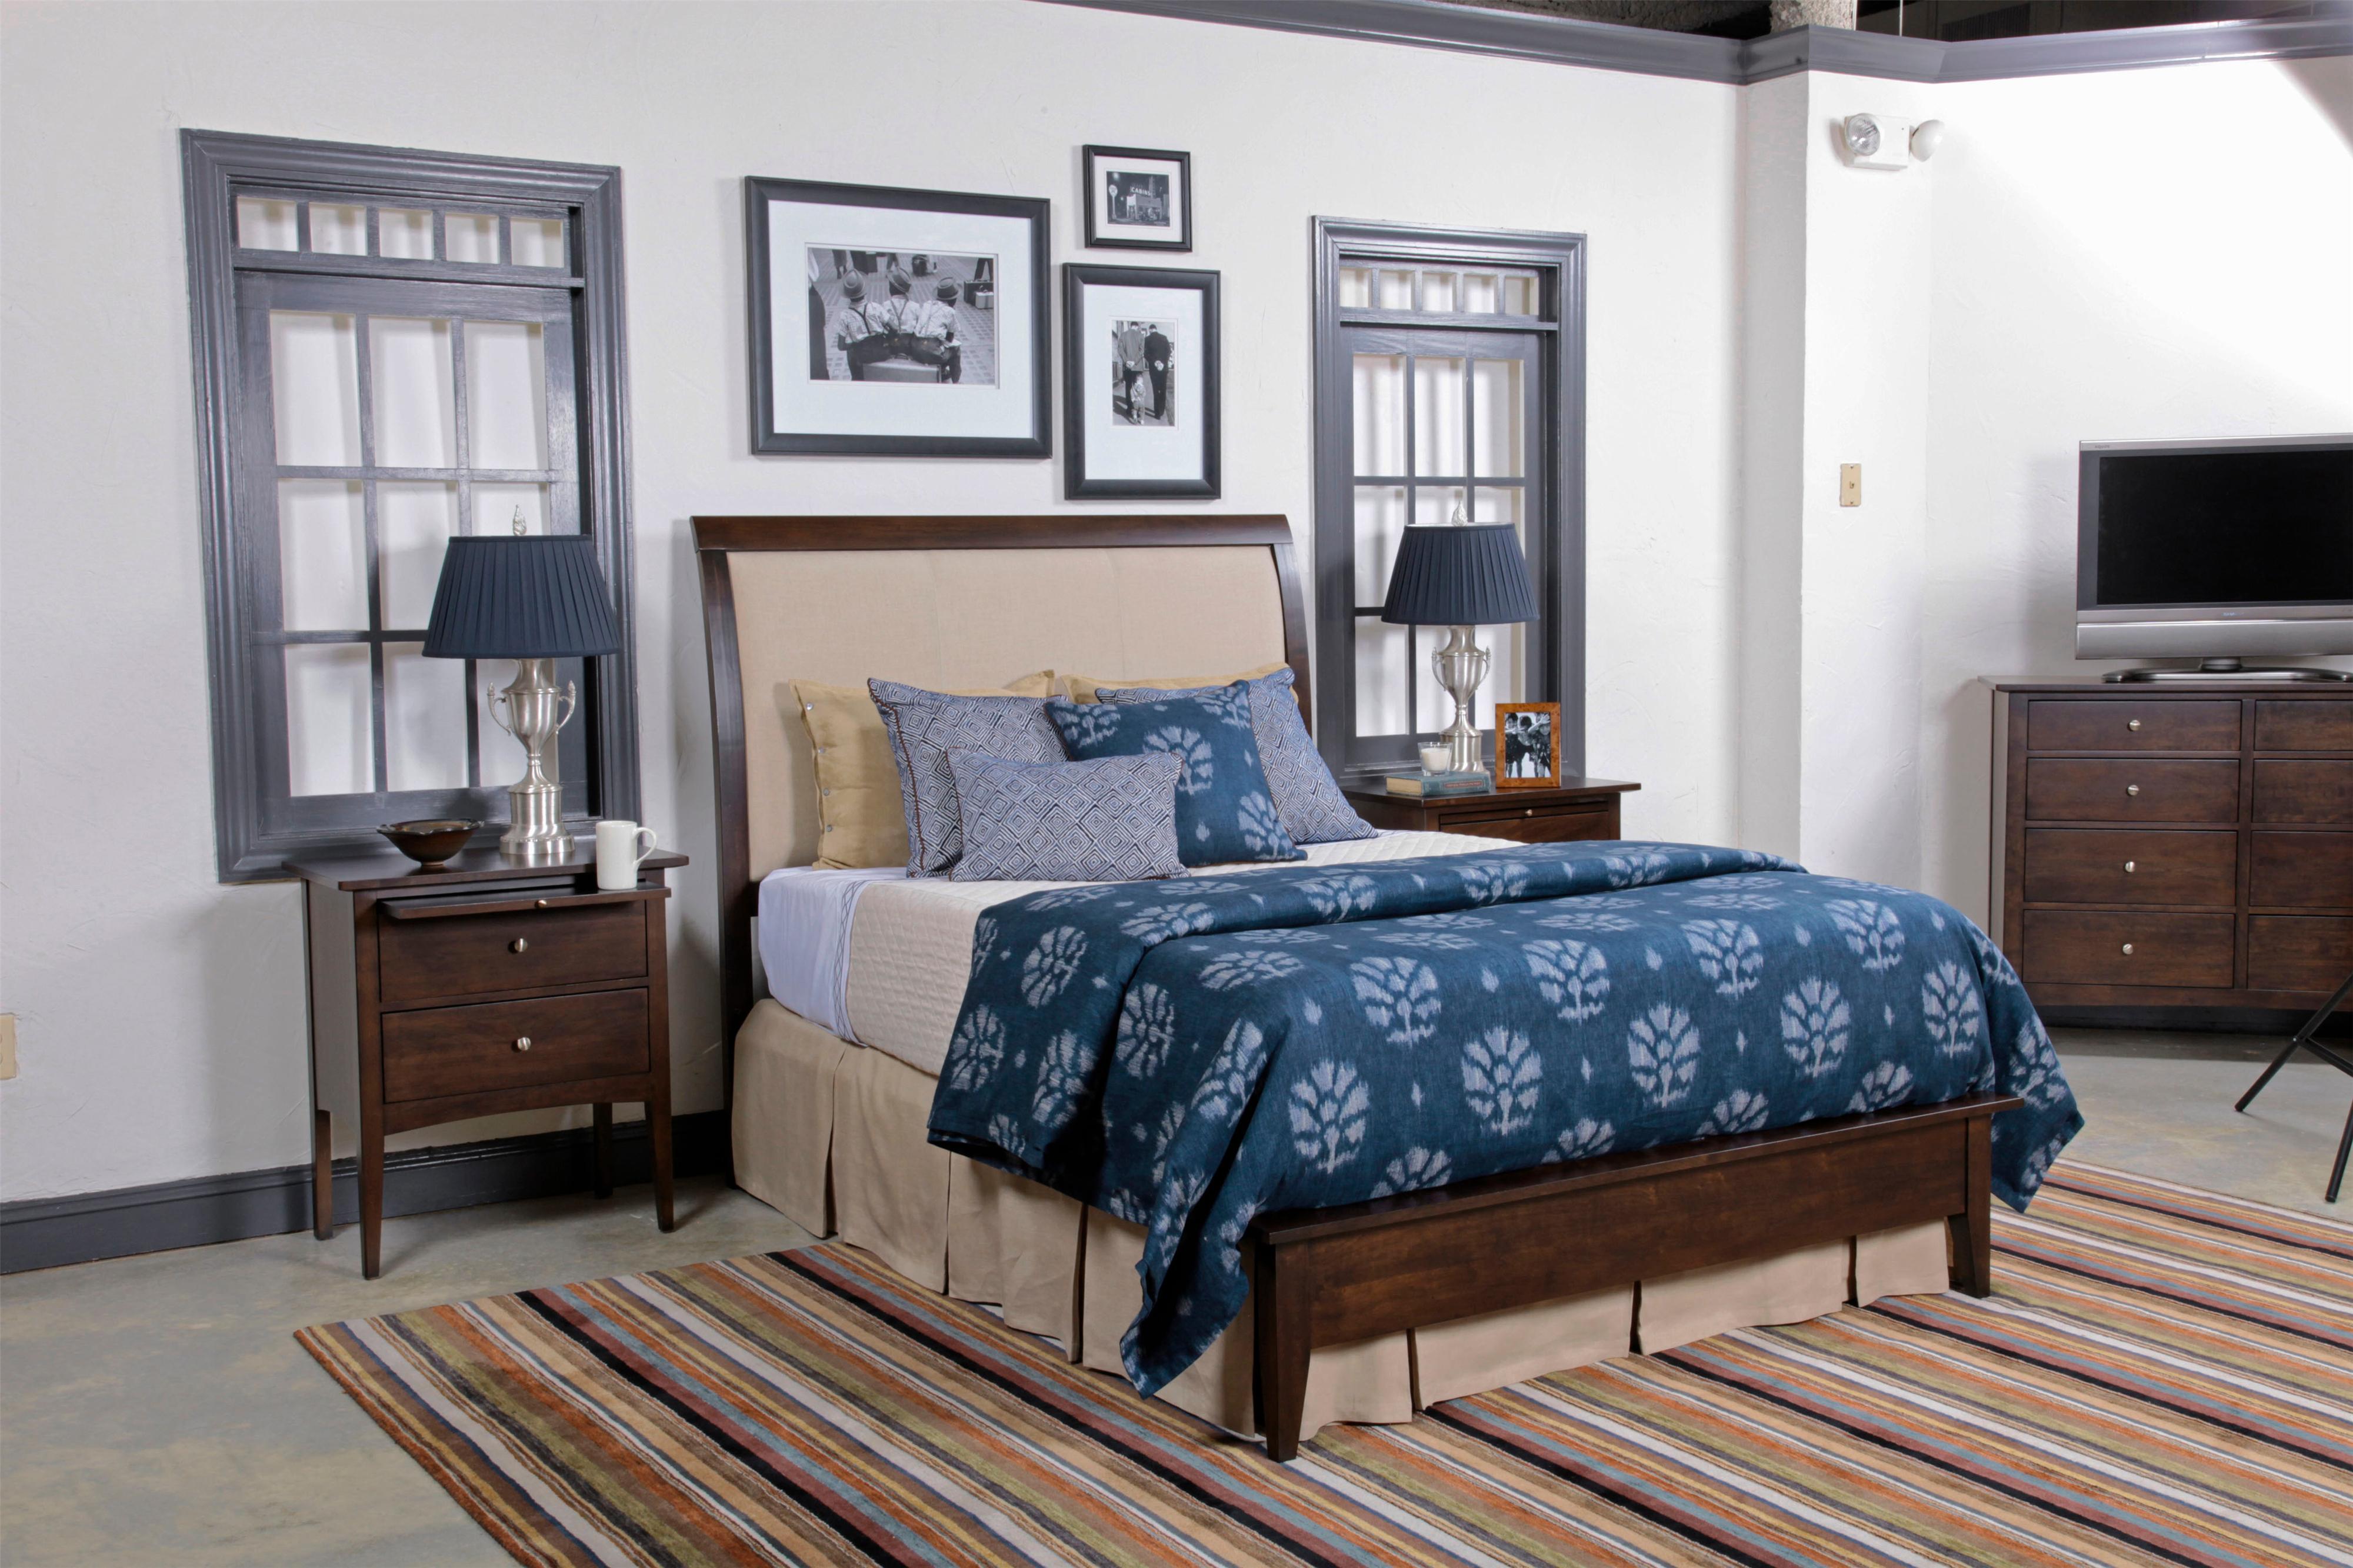 Kincaid Furniture Gatherings Q Bedroom Group - Item Number: Q Bedroom Group 9